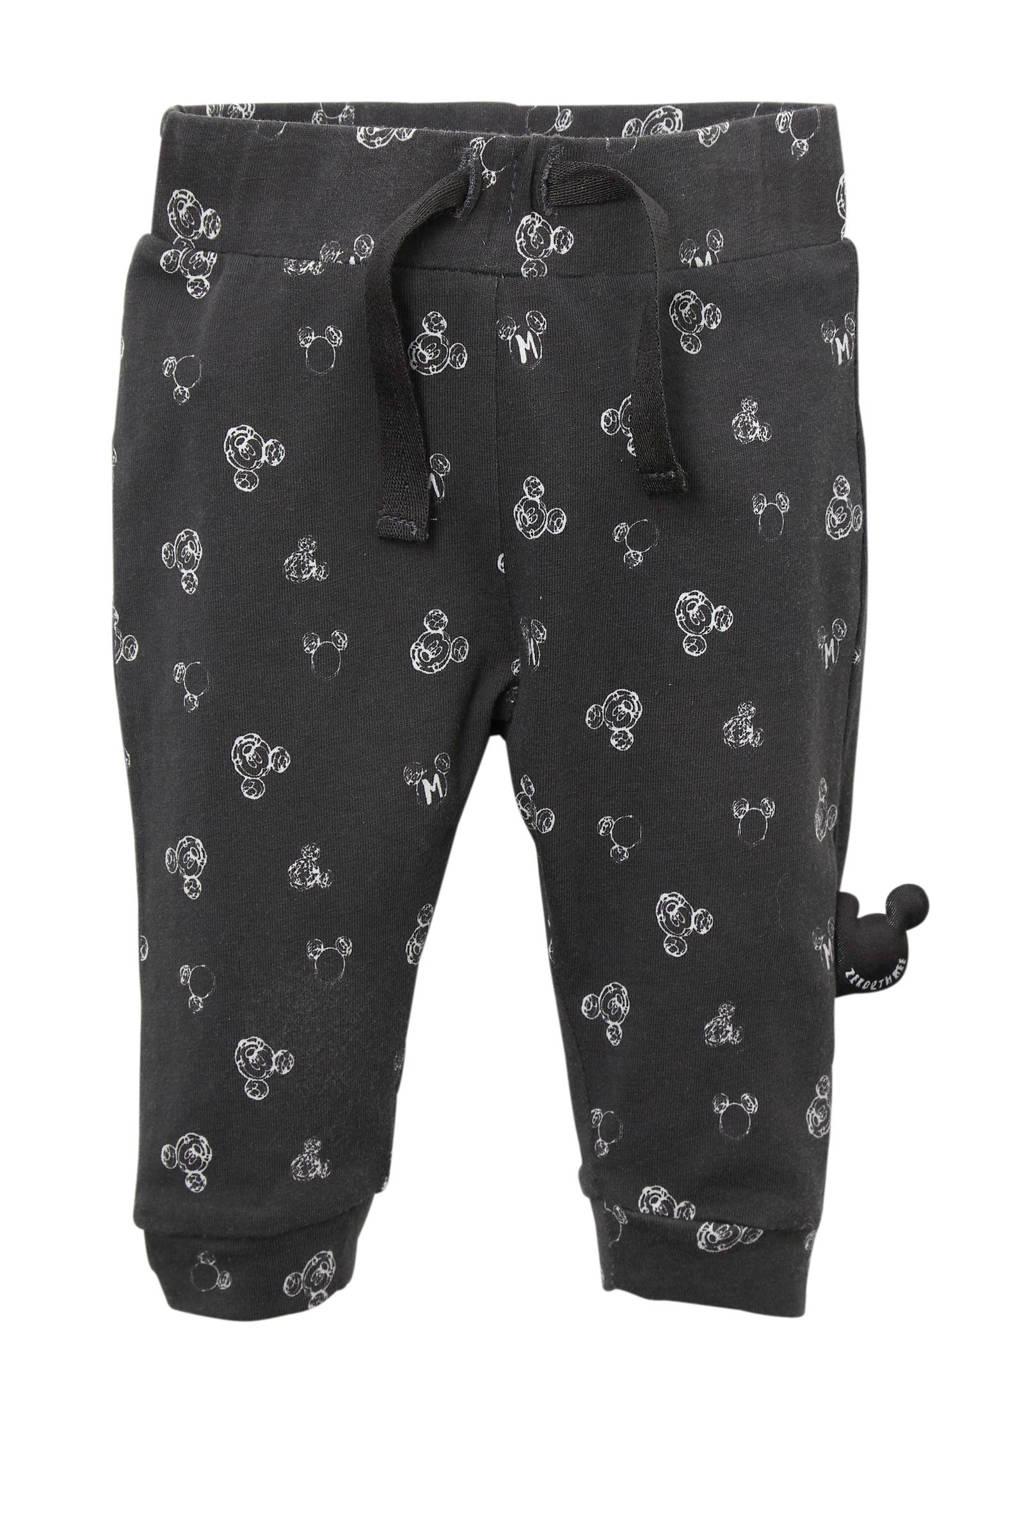 Zero2three newborn Mickey Mouse broek grijs, Antraciet